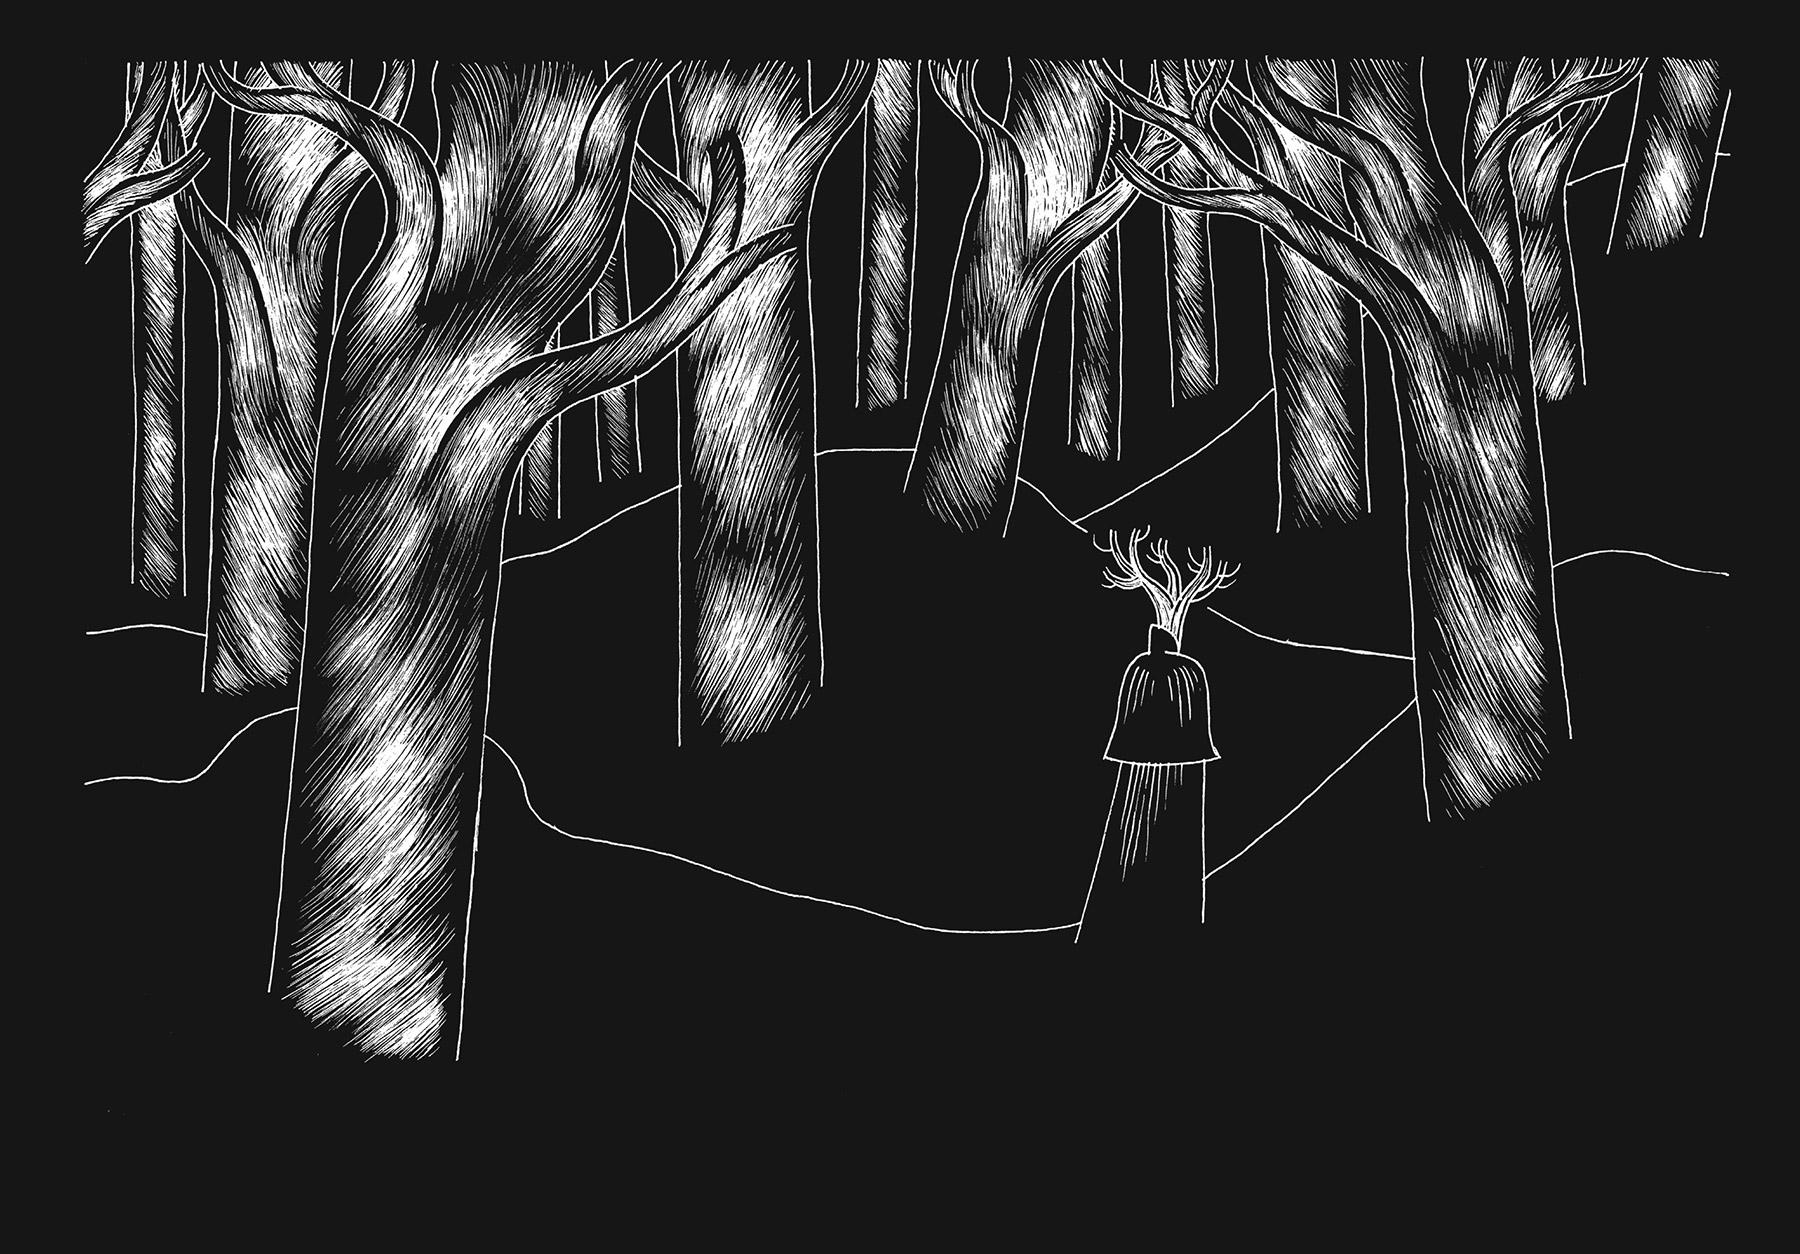 davidm-arboreal-web_expanded-3.jpg